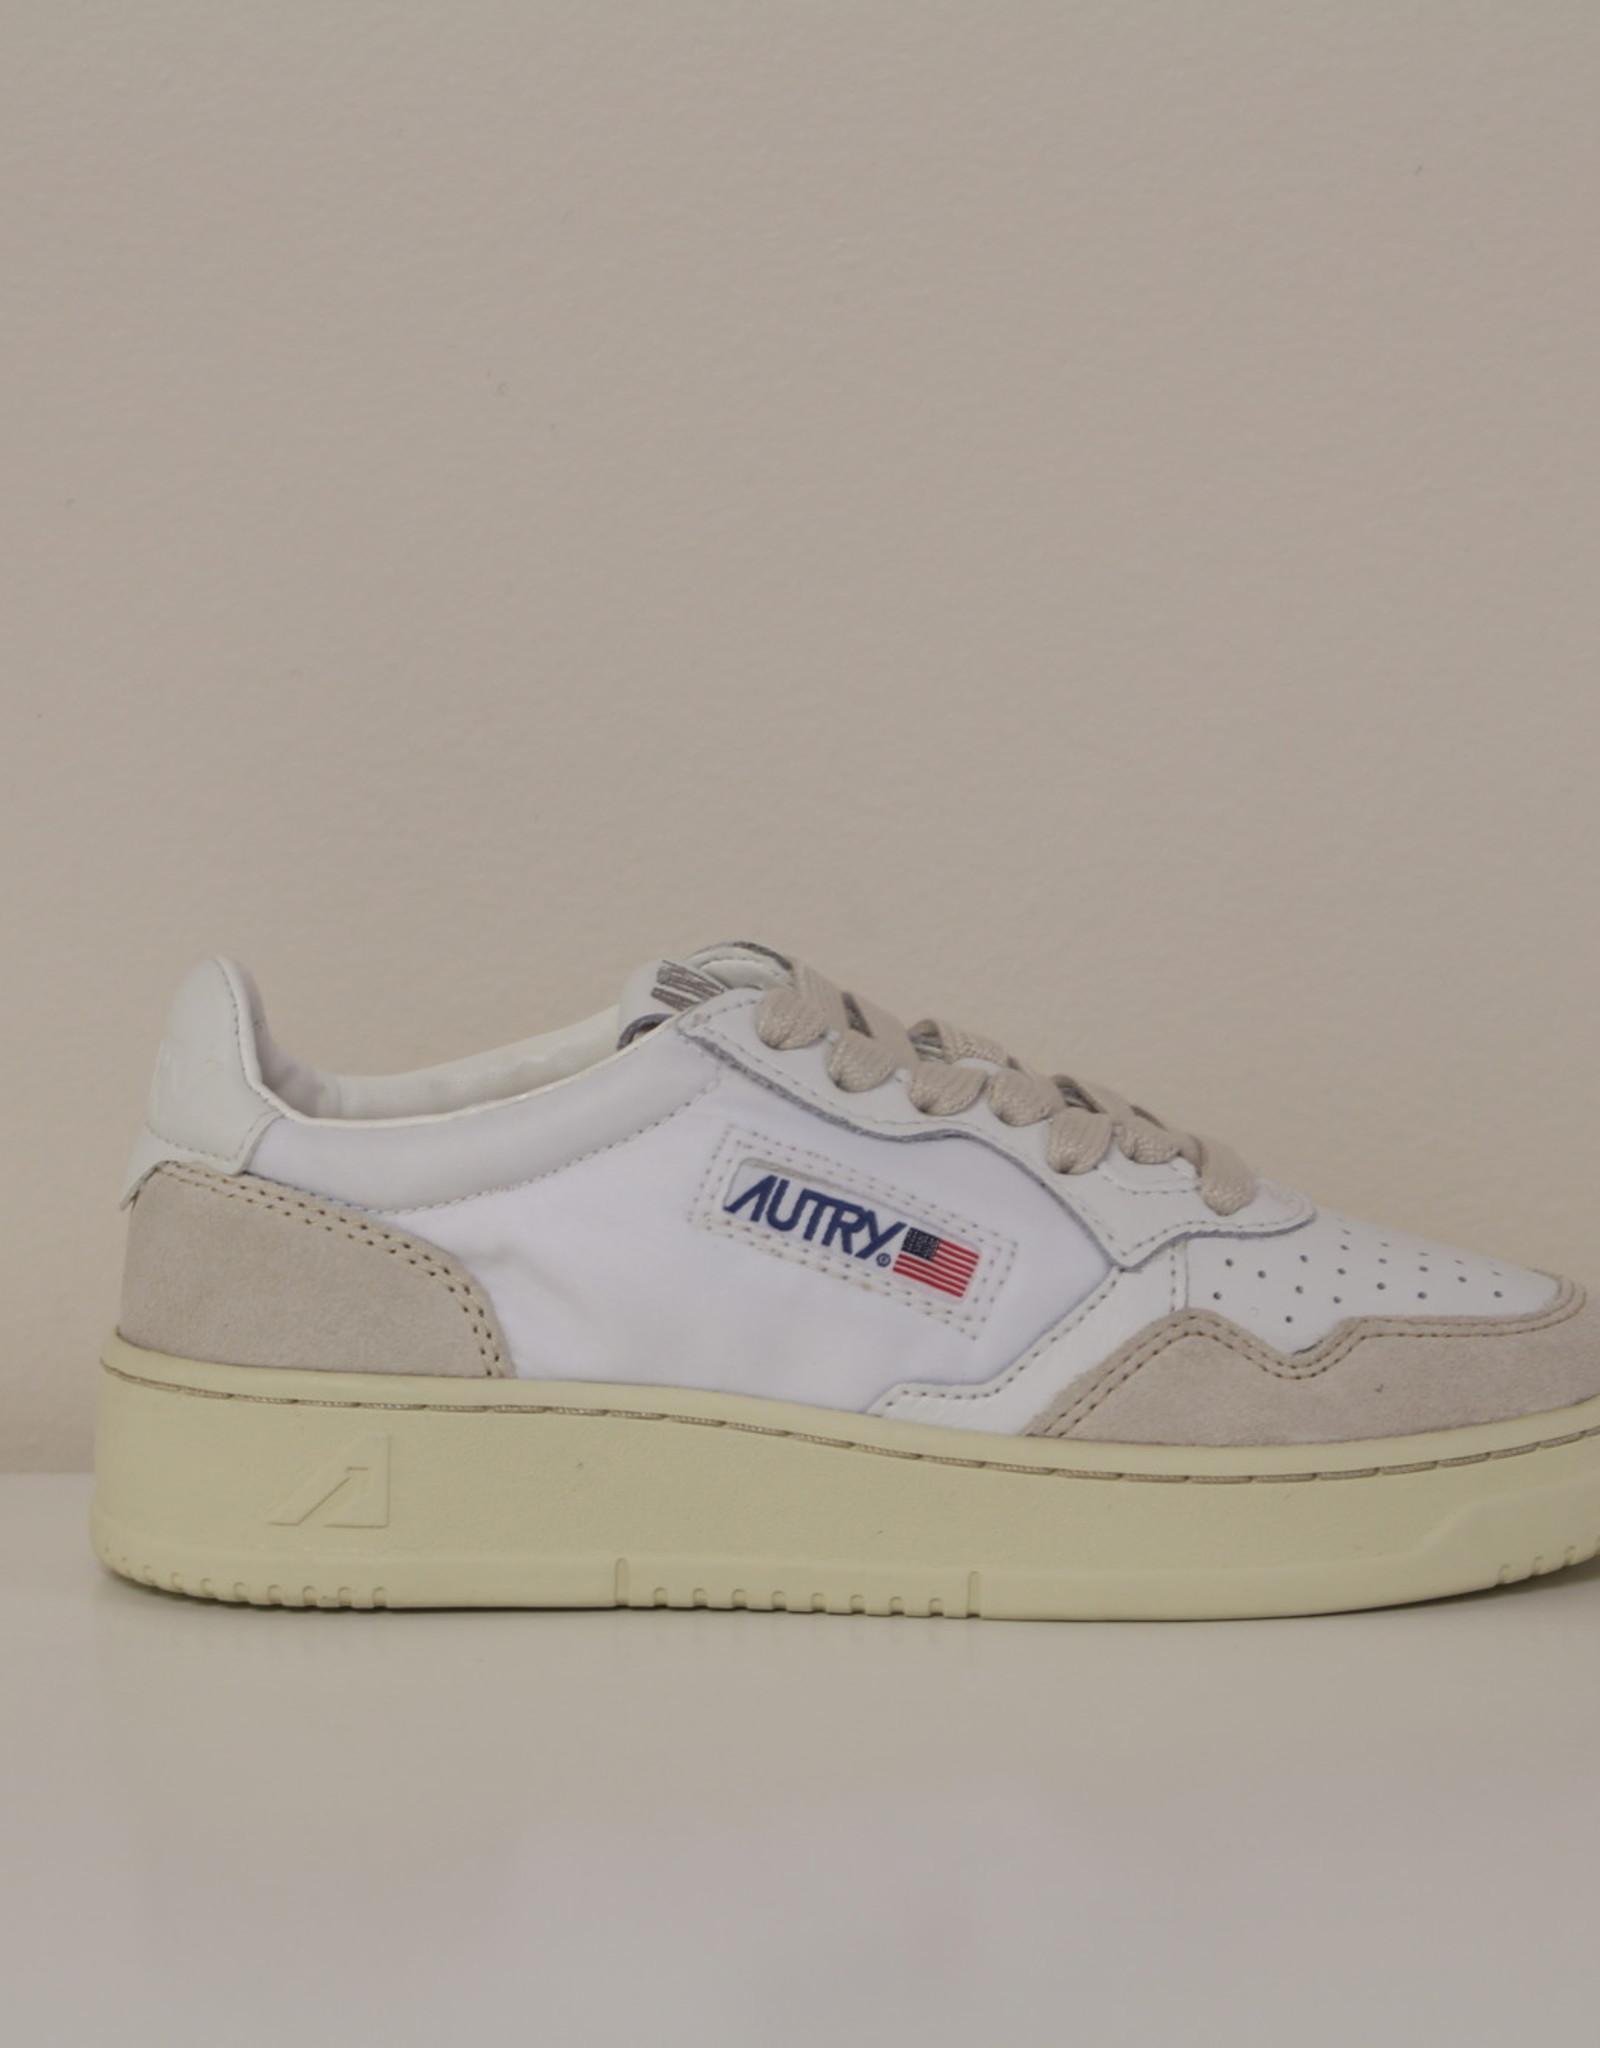 Autry sneaker suede/nylon wit